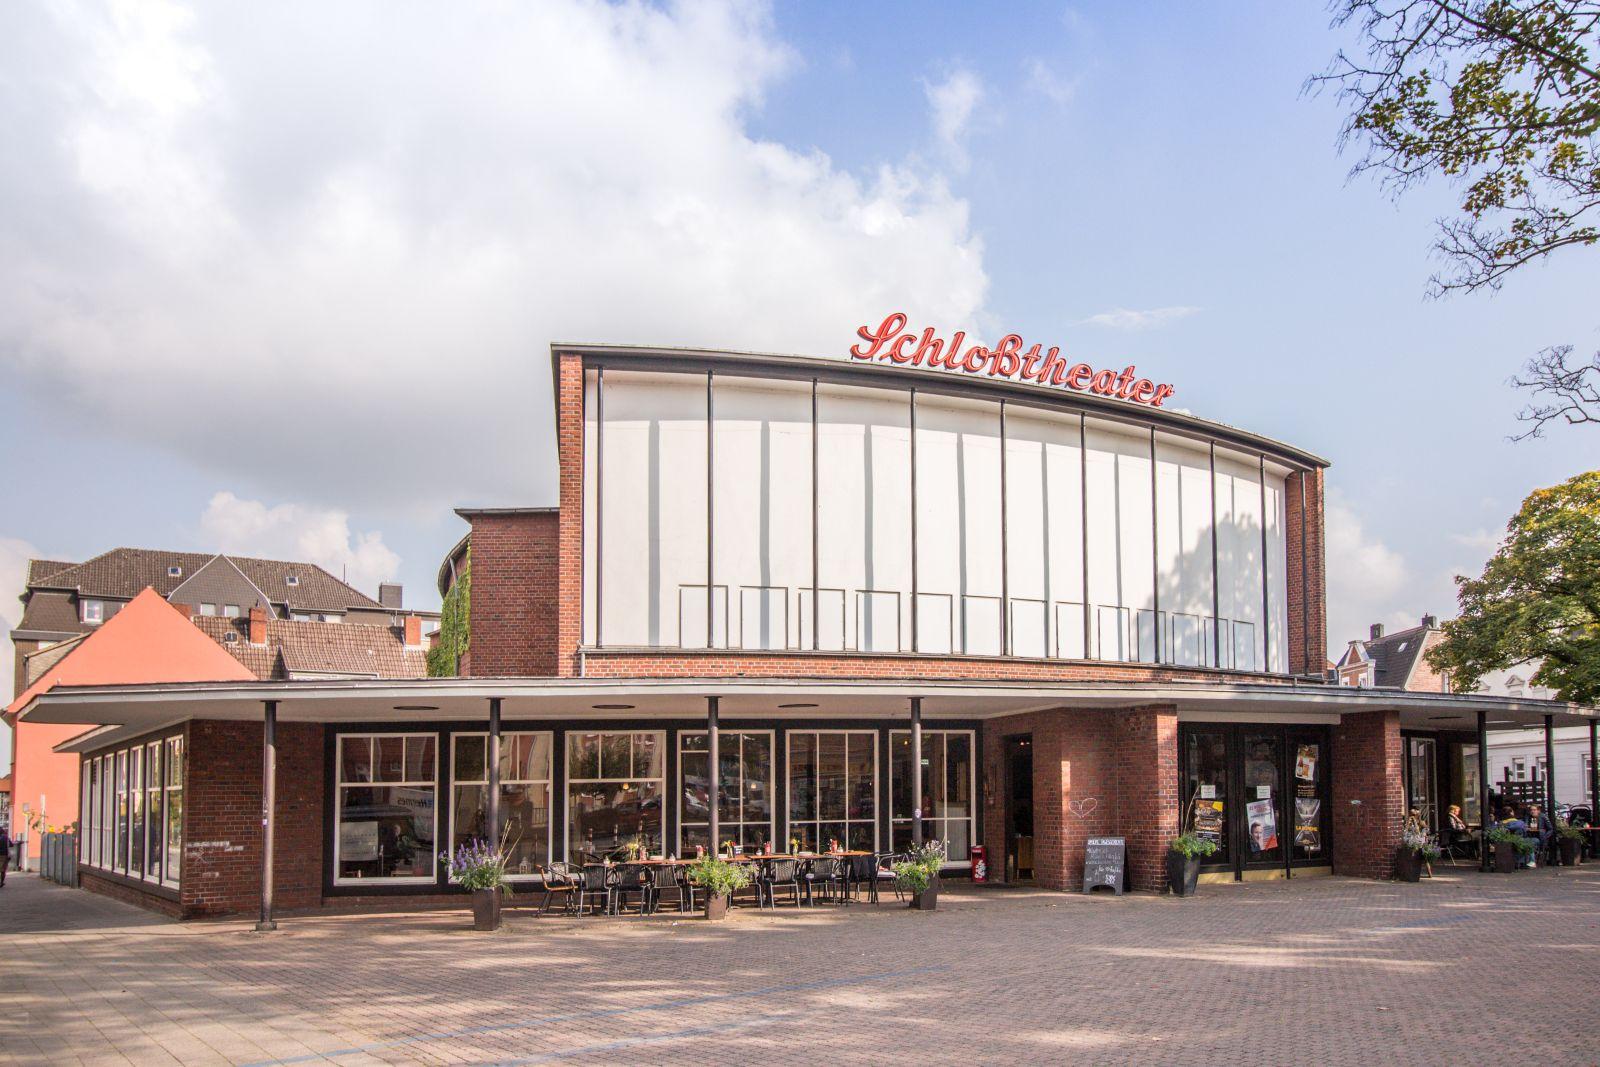 Schlosstheater Kino Münster